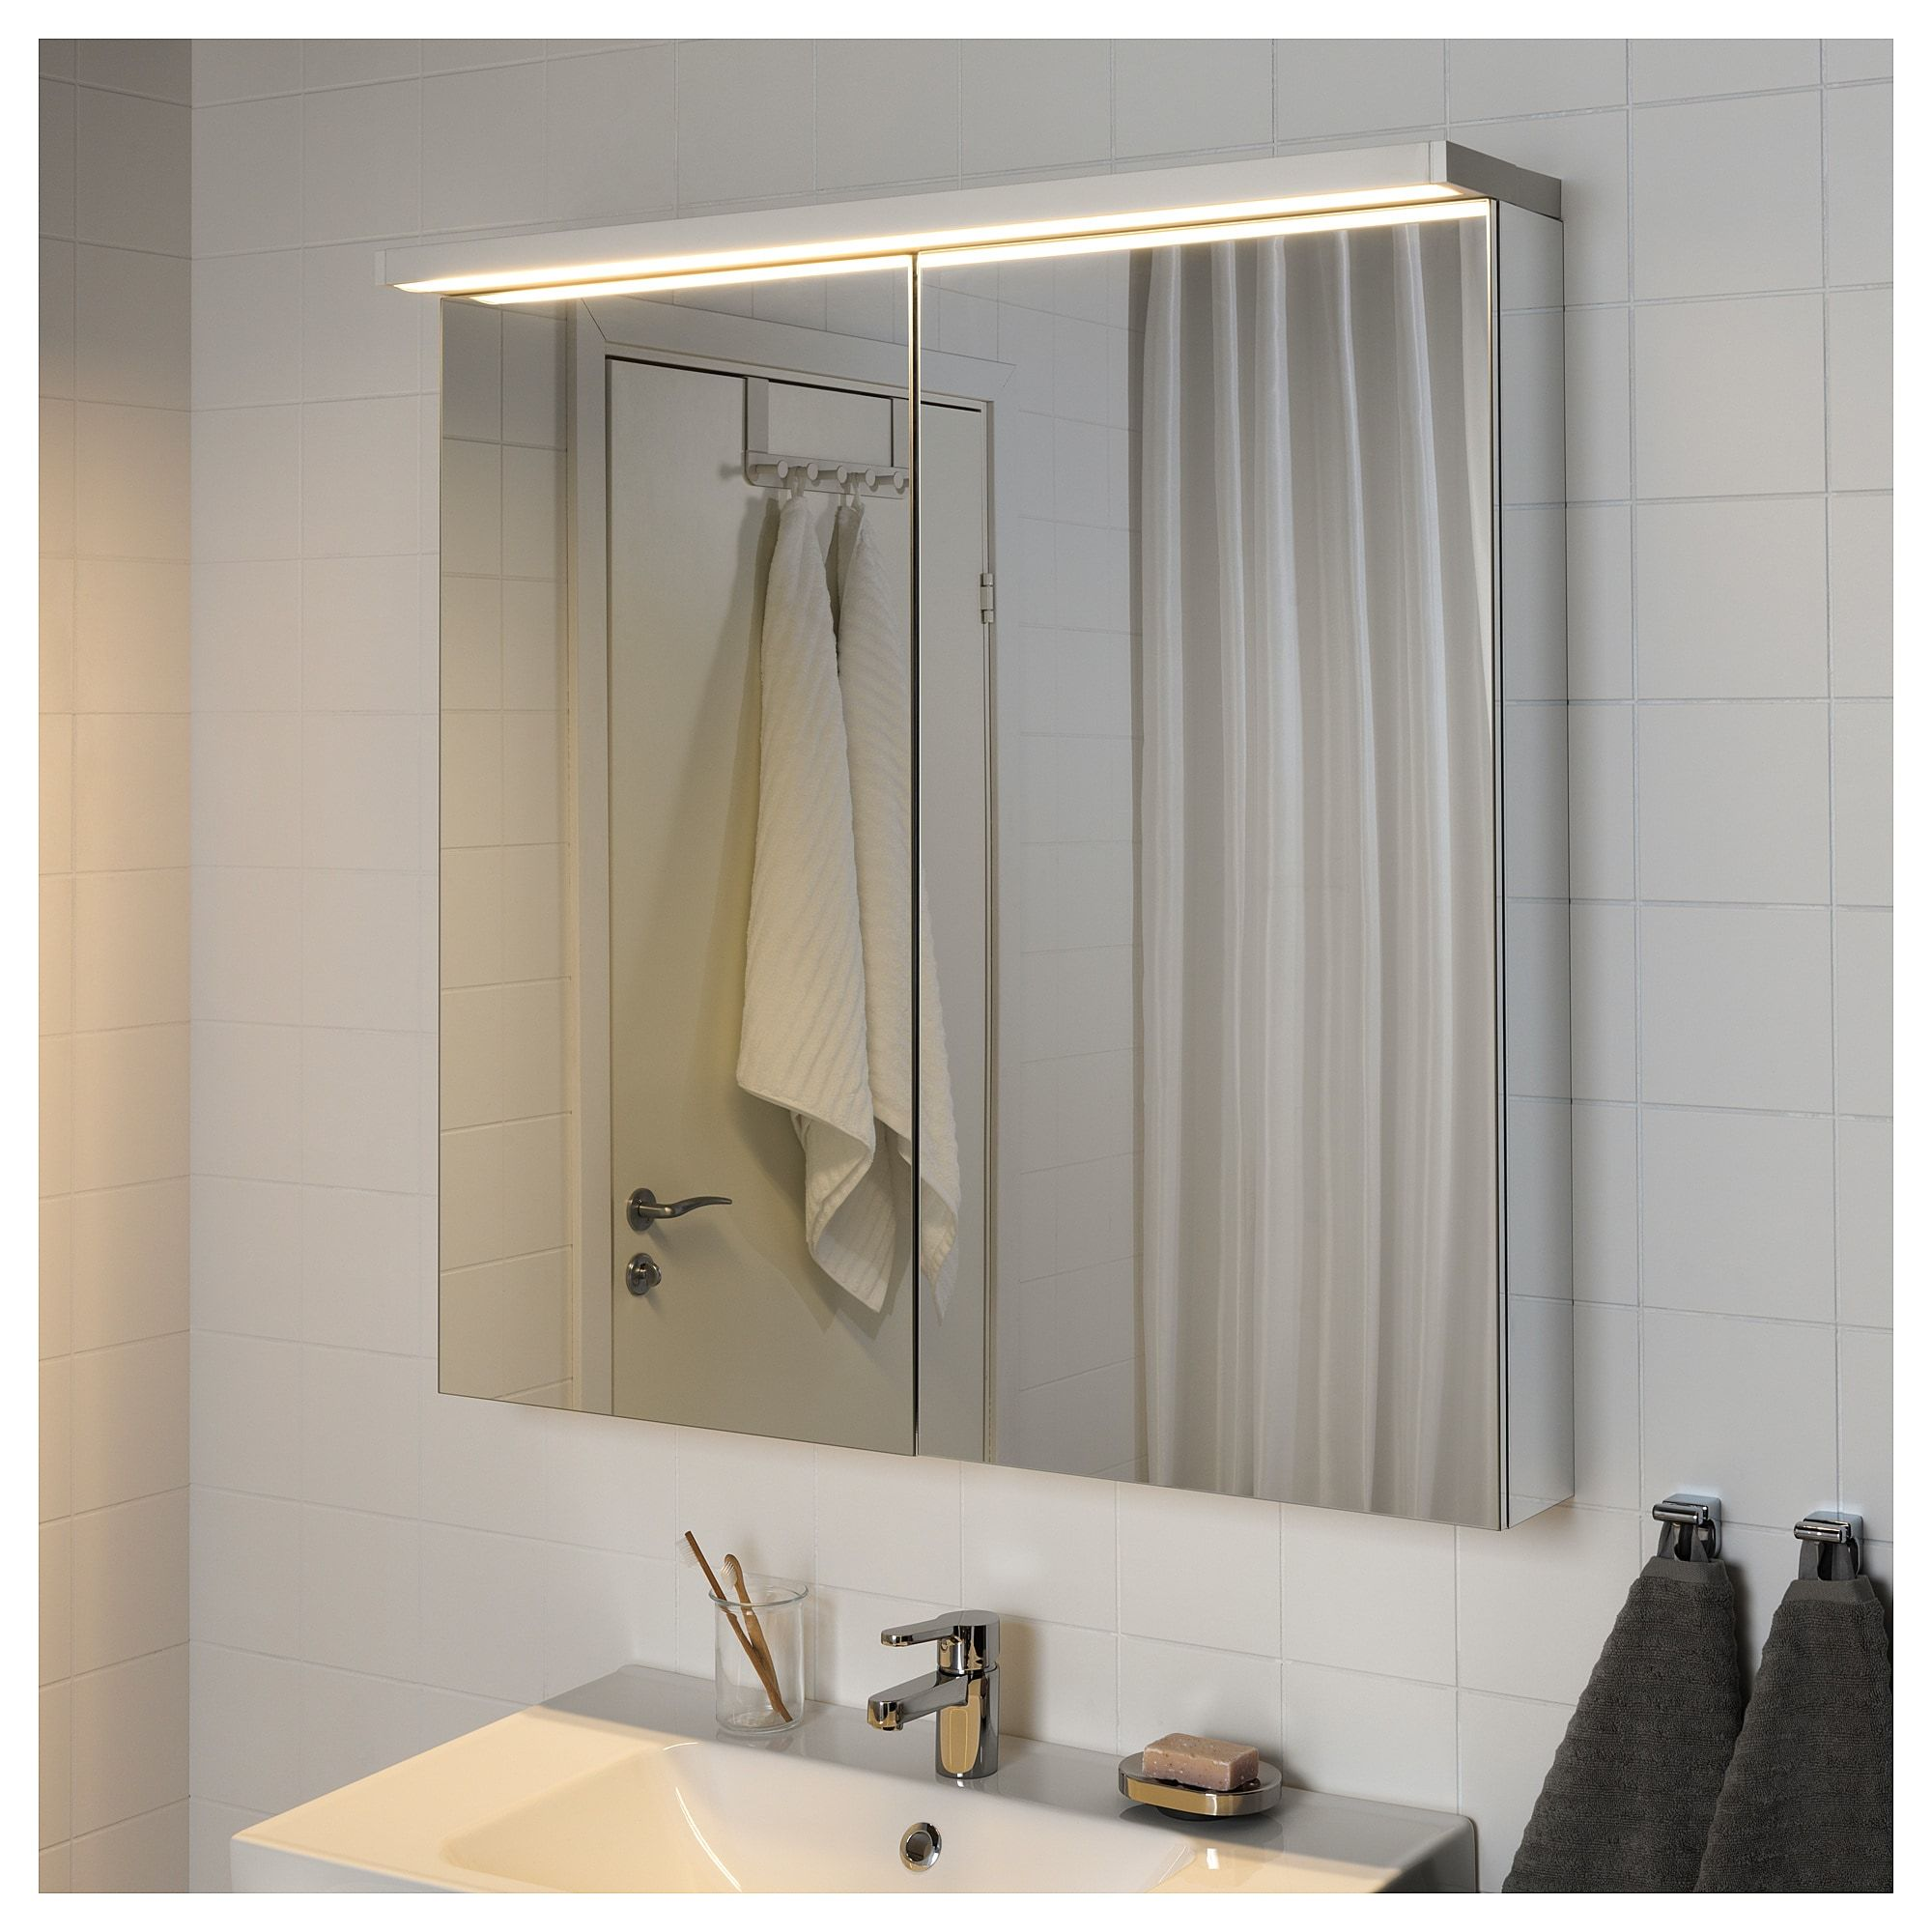 Luminaire Wc Ikea Gamboahinestrosa